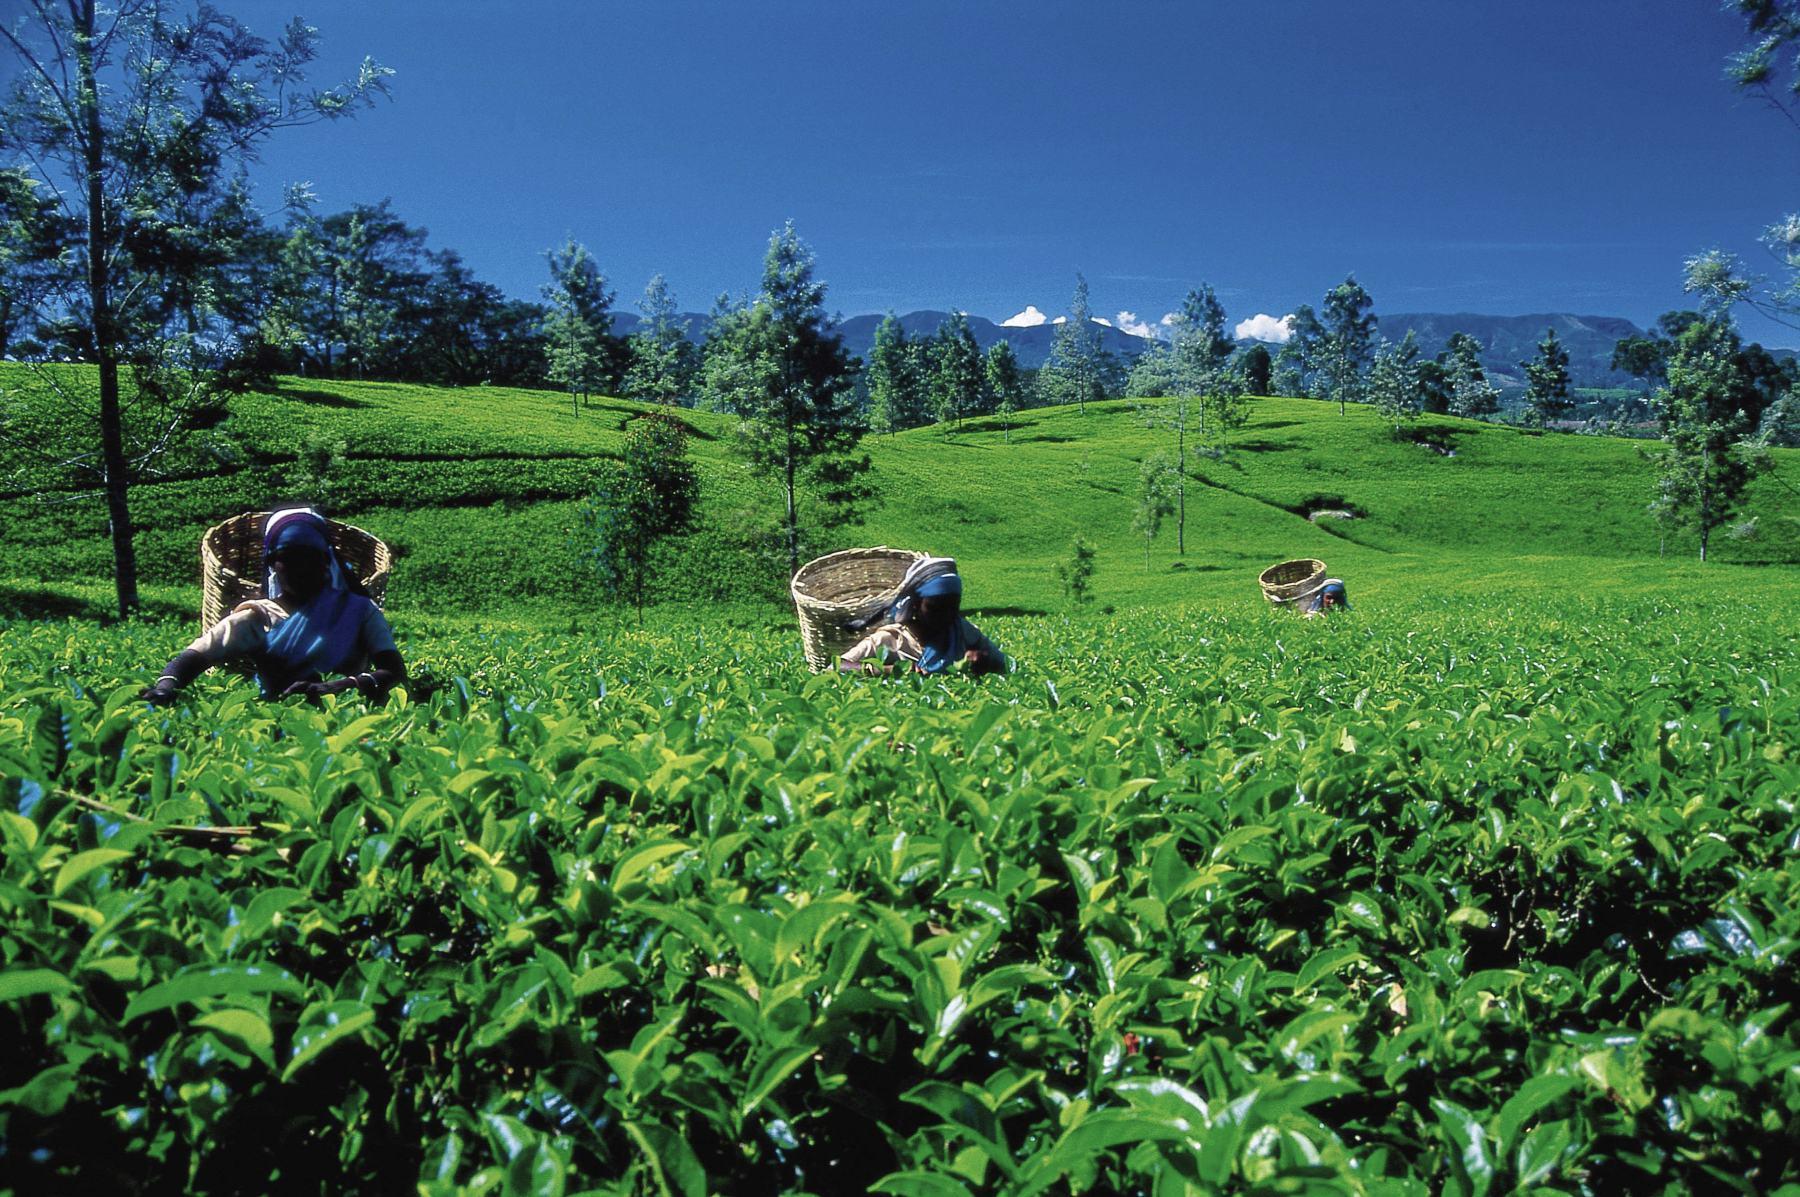 Arbeiterinnen auf einer Teeplantage ernten feinen Ceylon Tee – Sri Lanka kompakt